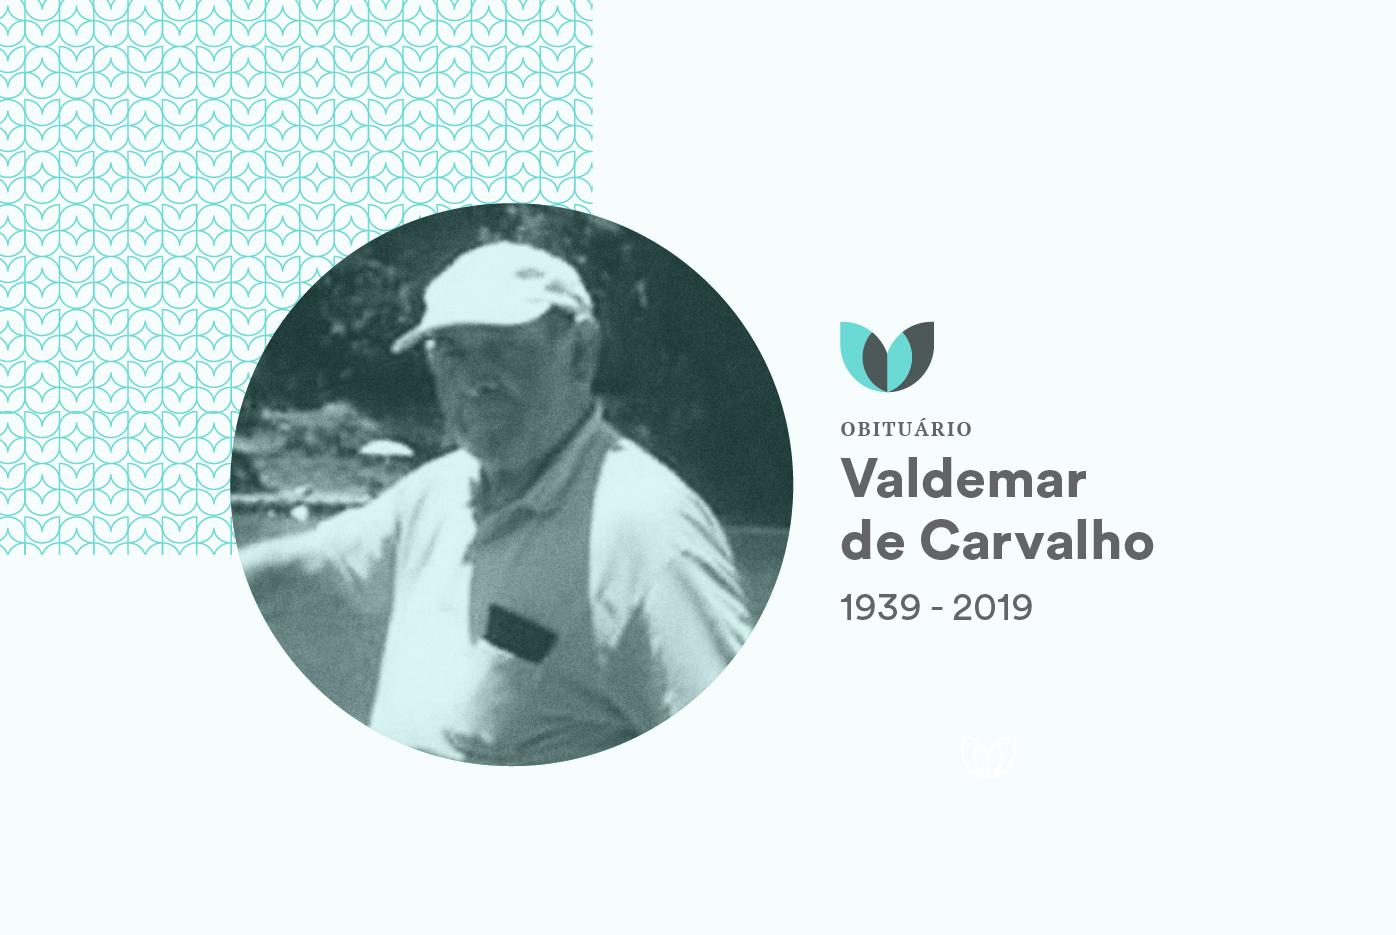 Obituario-Valdemar-Squarespace.png